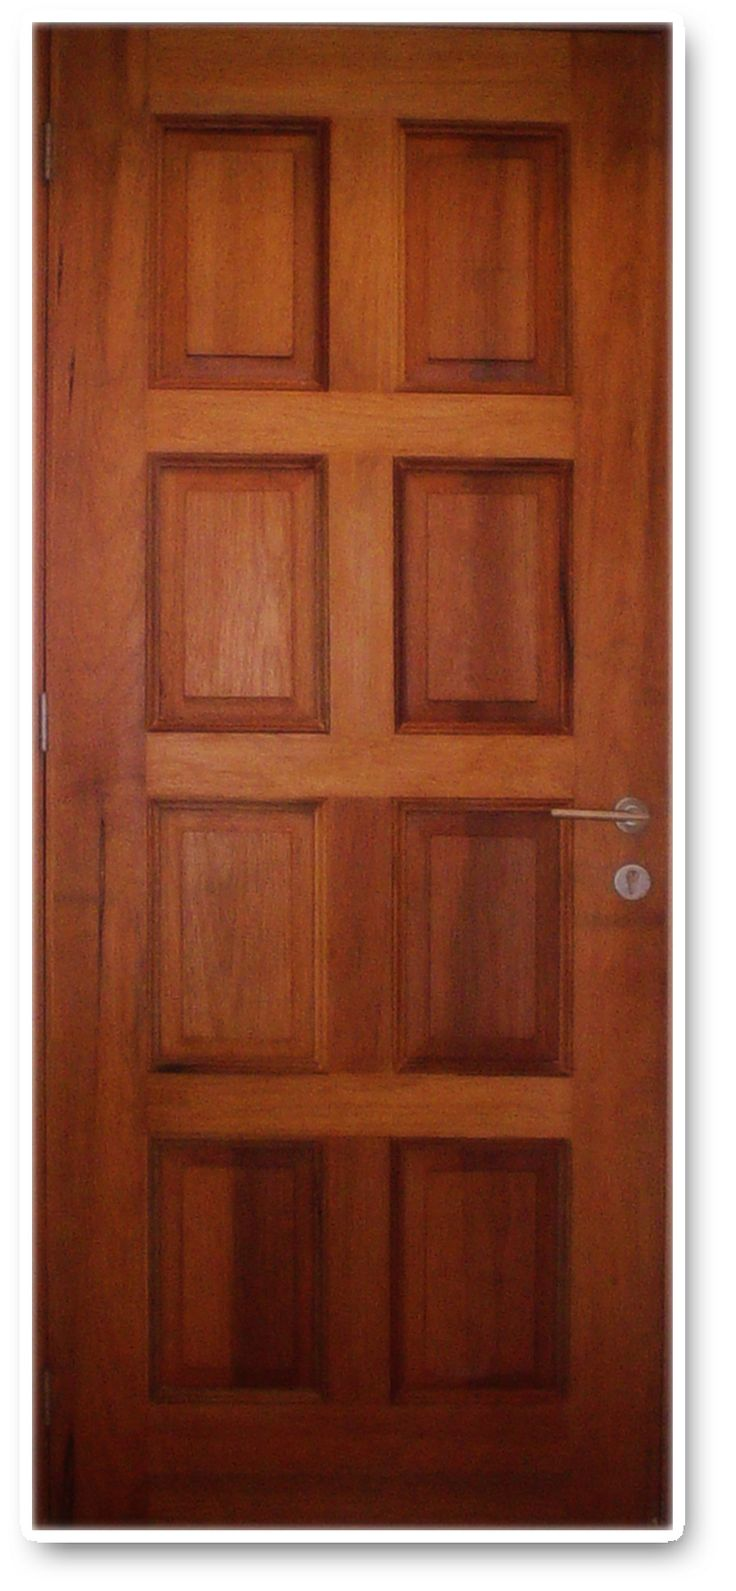 puerta 8 tableros madera cedro puerta pinterest